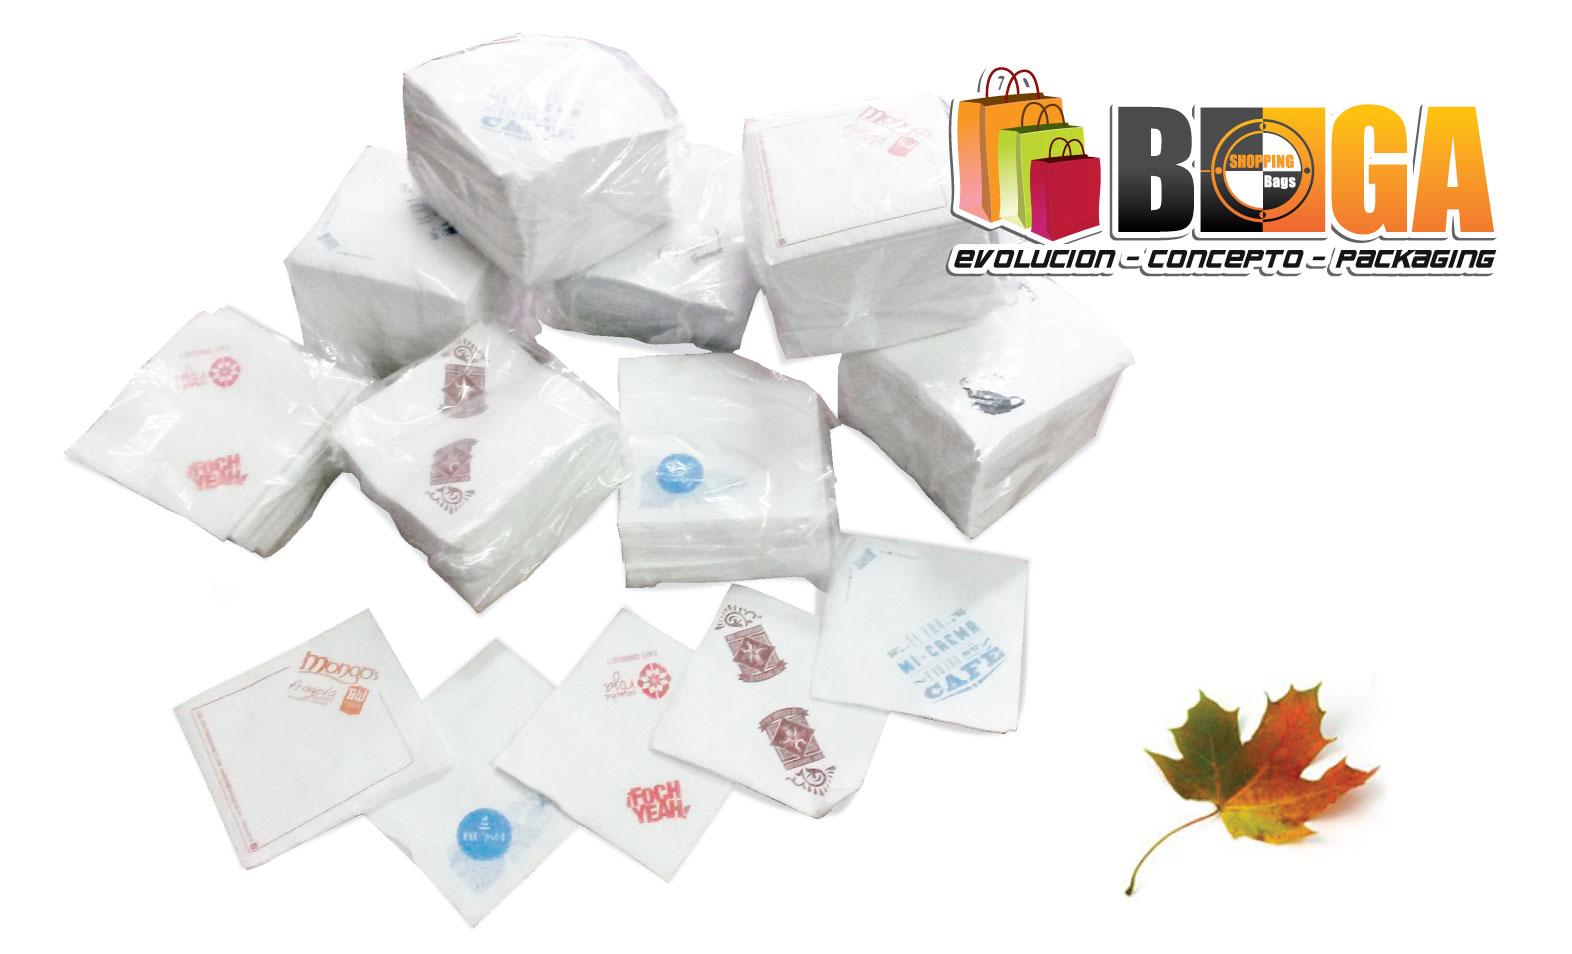 servilletas-impresas-desde-1000-unidades-fundas-de-papel-quito-ecuador